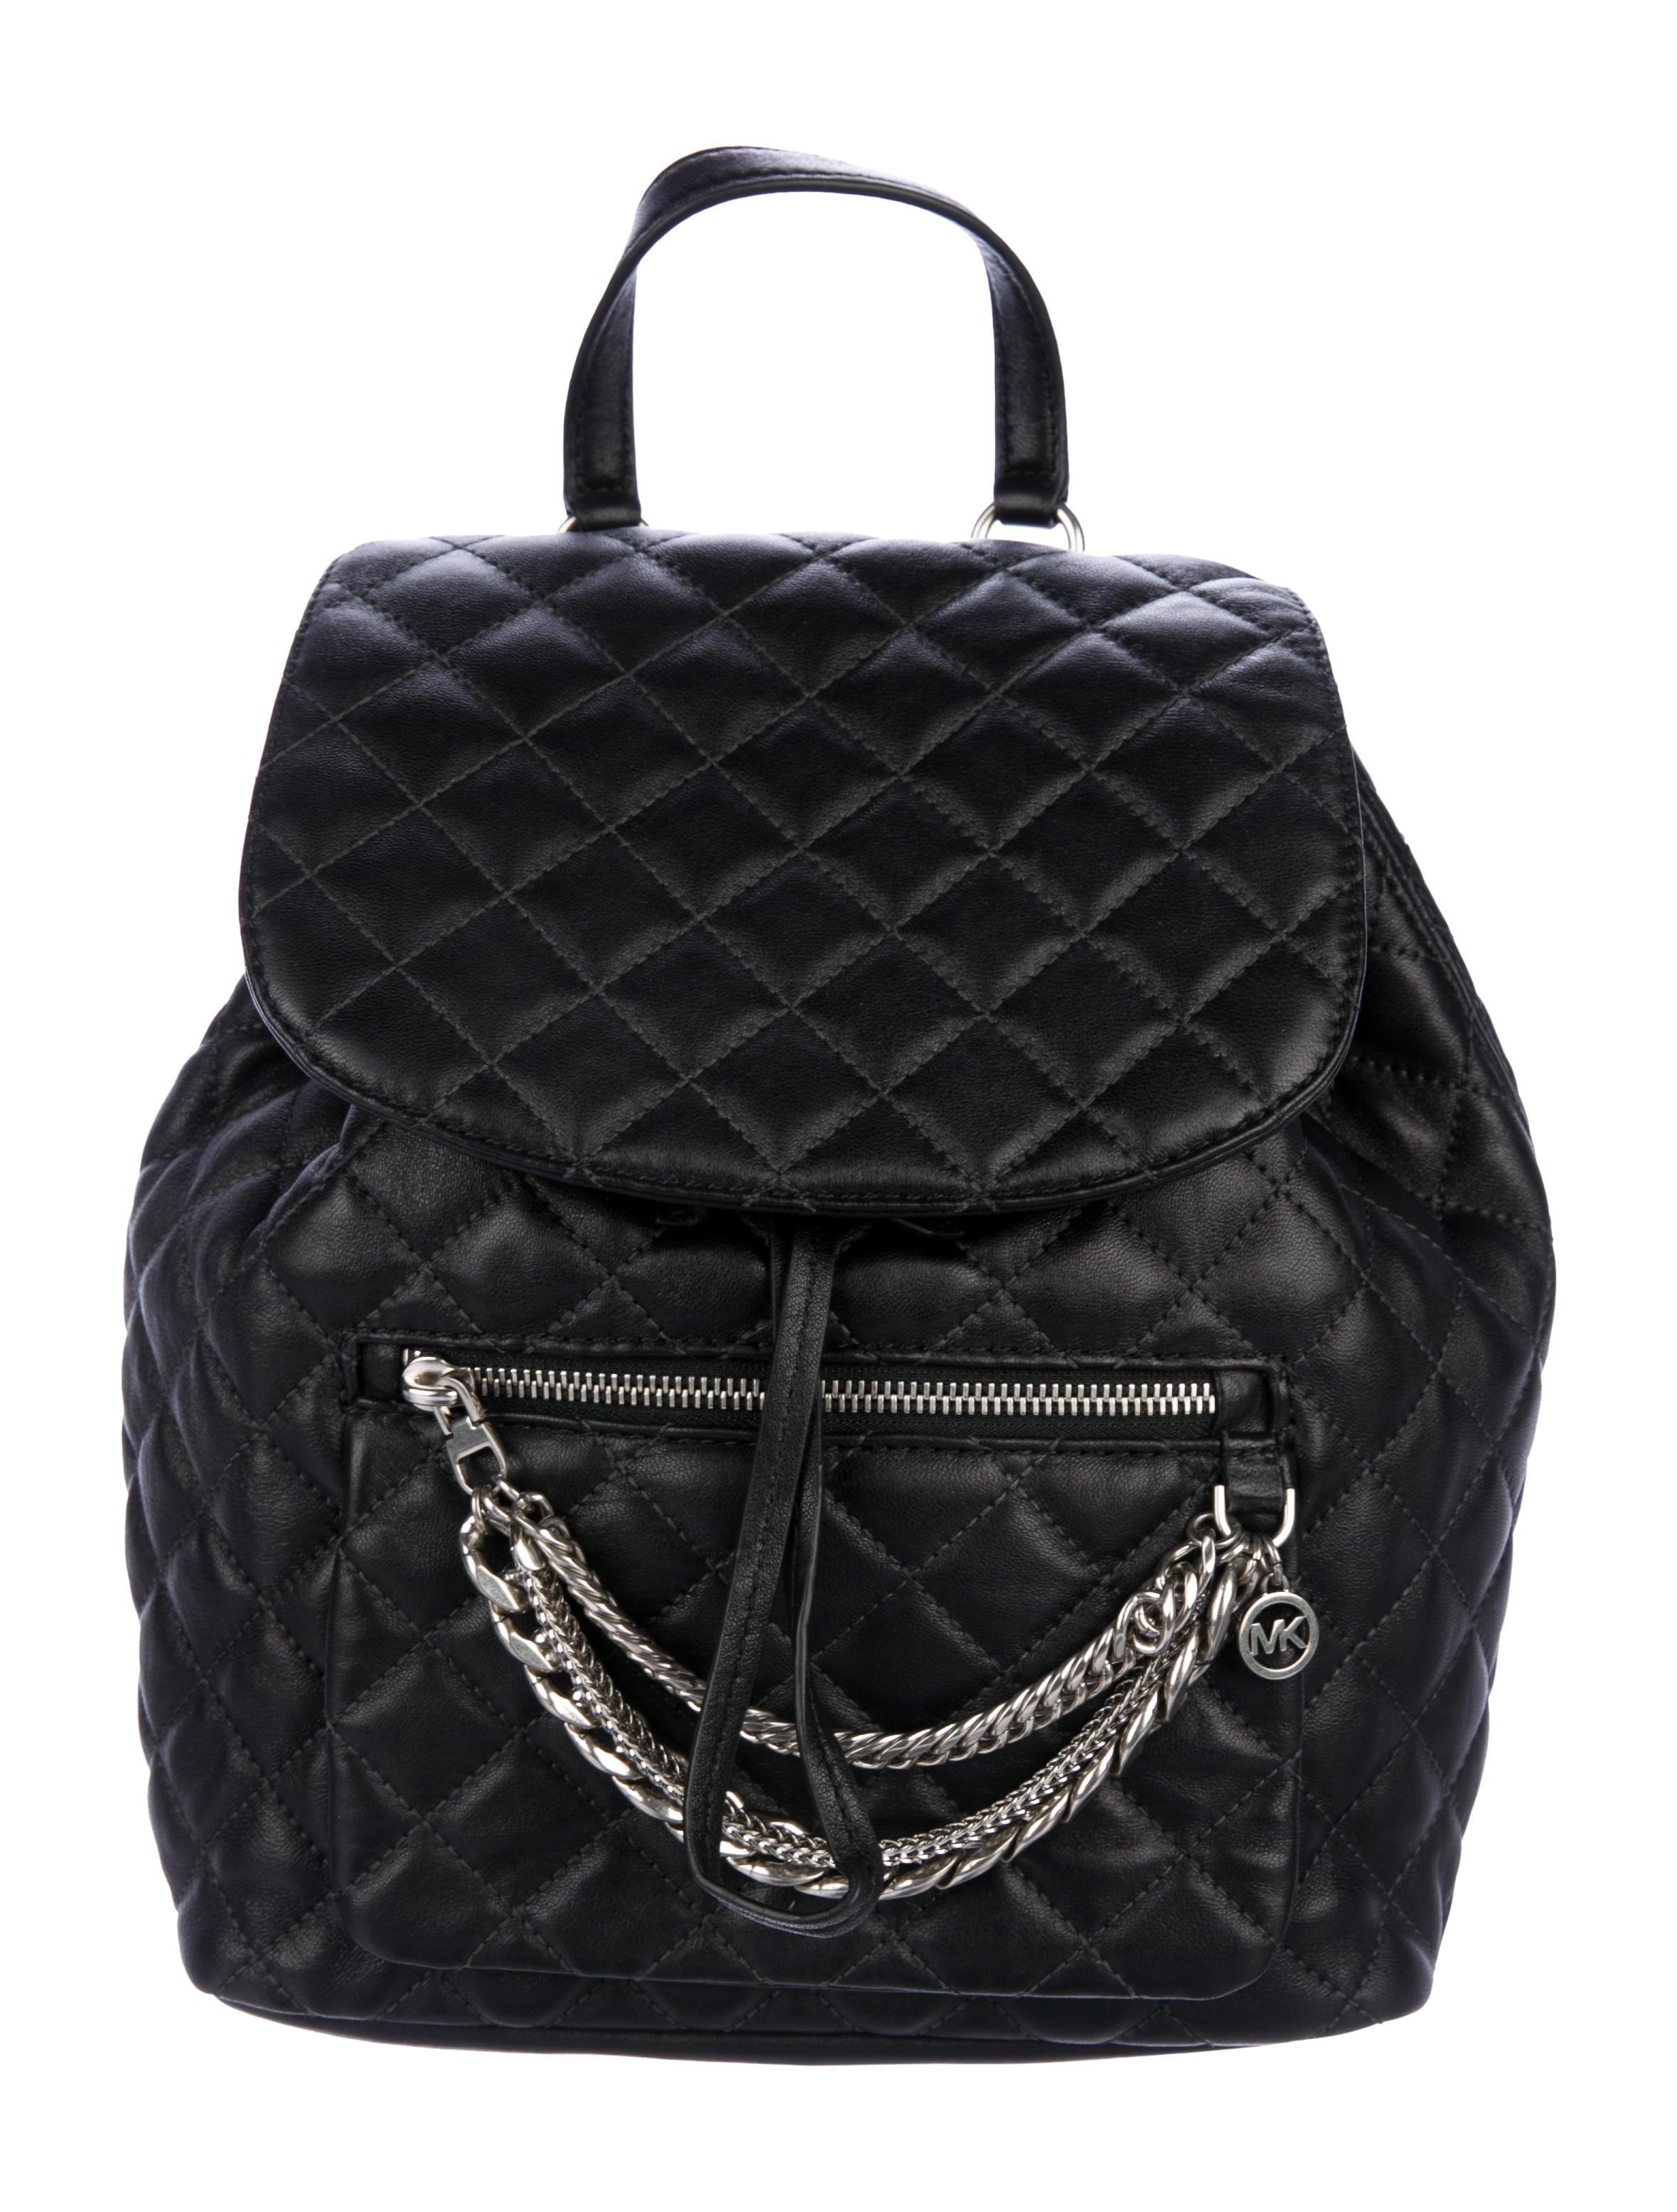 a110f7cb4490 Michael Michael Kors Cheyenne Quilted Drawstring Backpack - Handbags ...